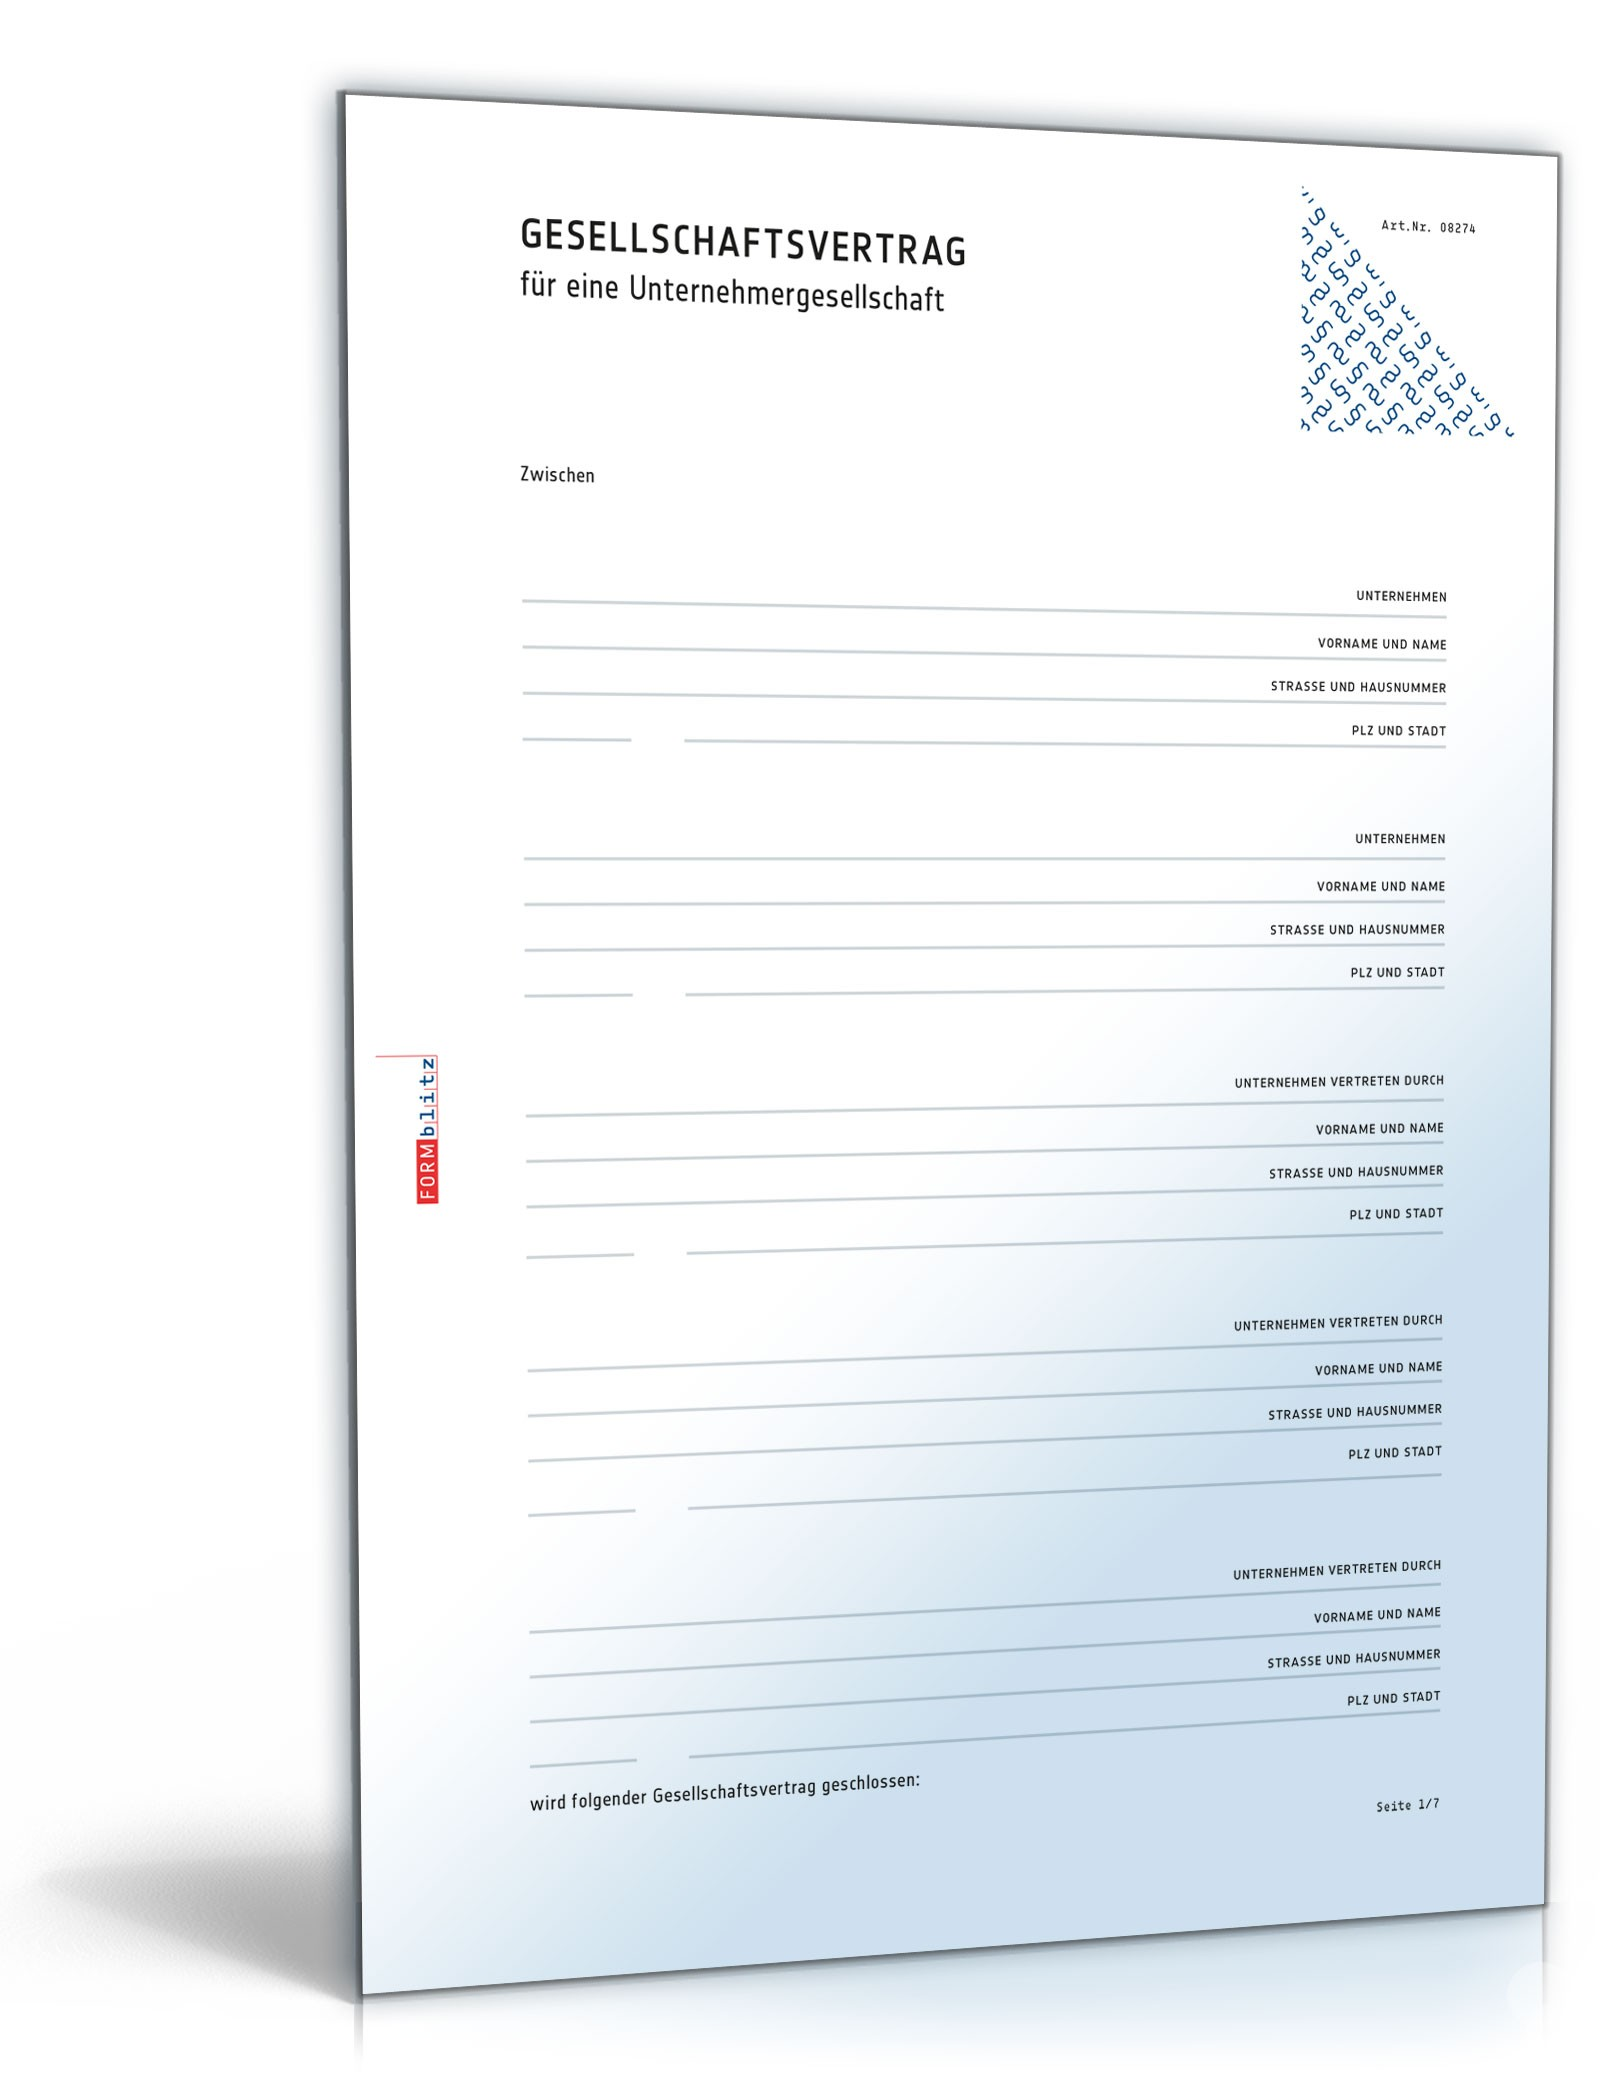 Gesellschaftsvertrag Ug Rechtssicheres Muster Zum Download